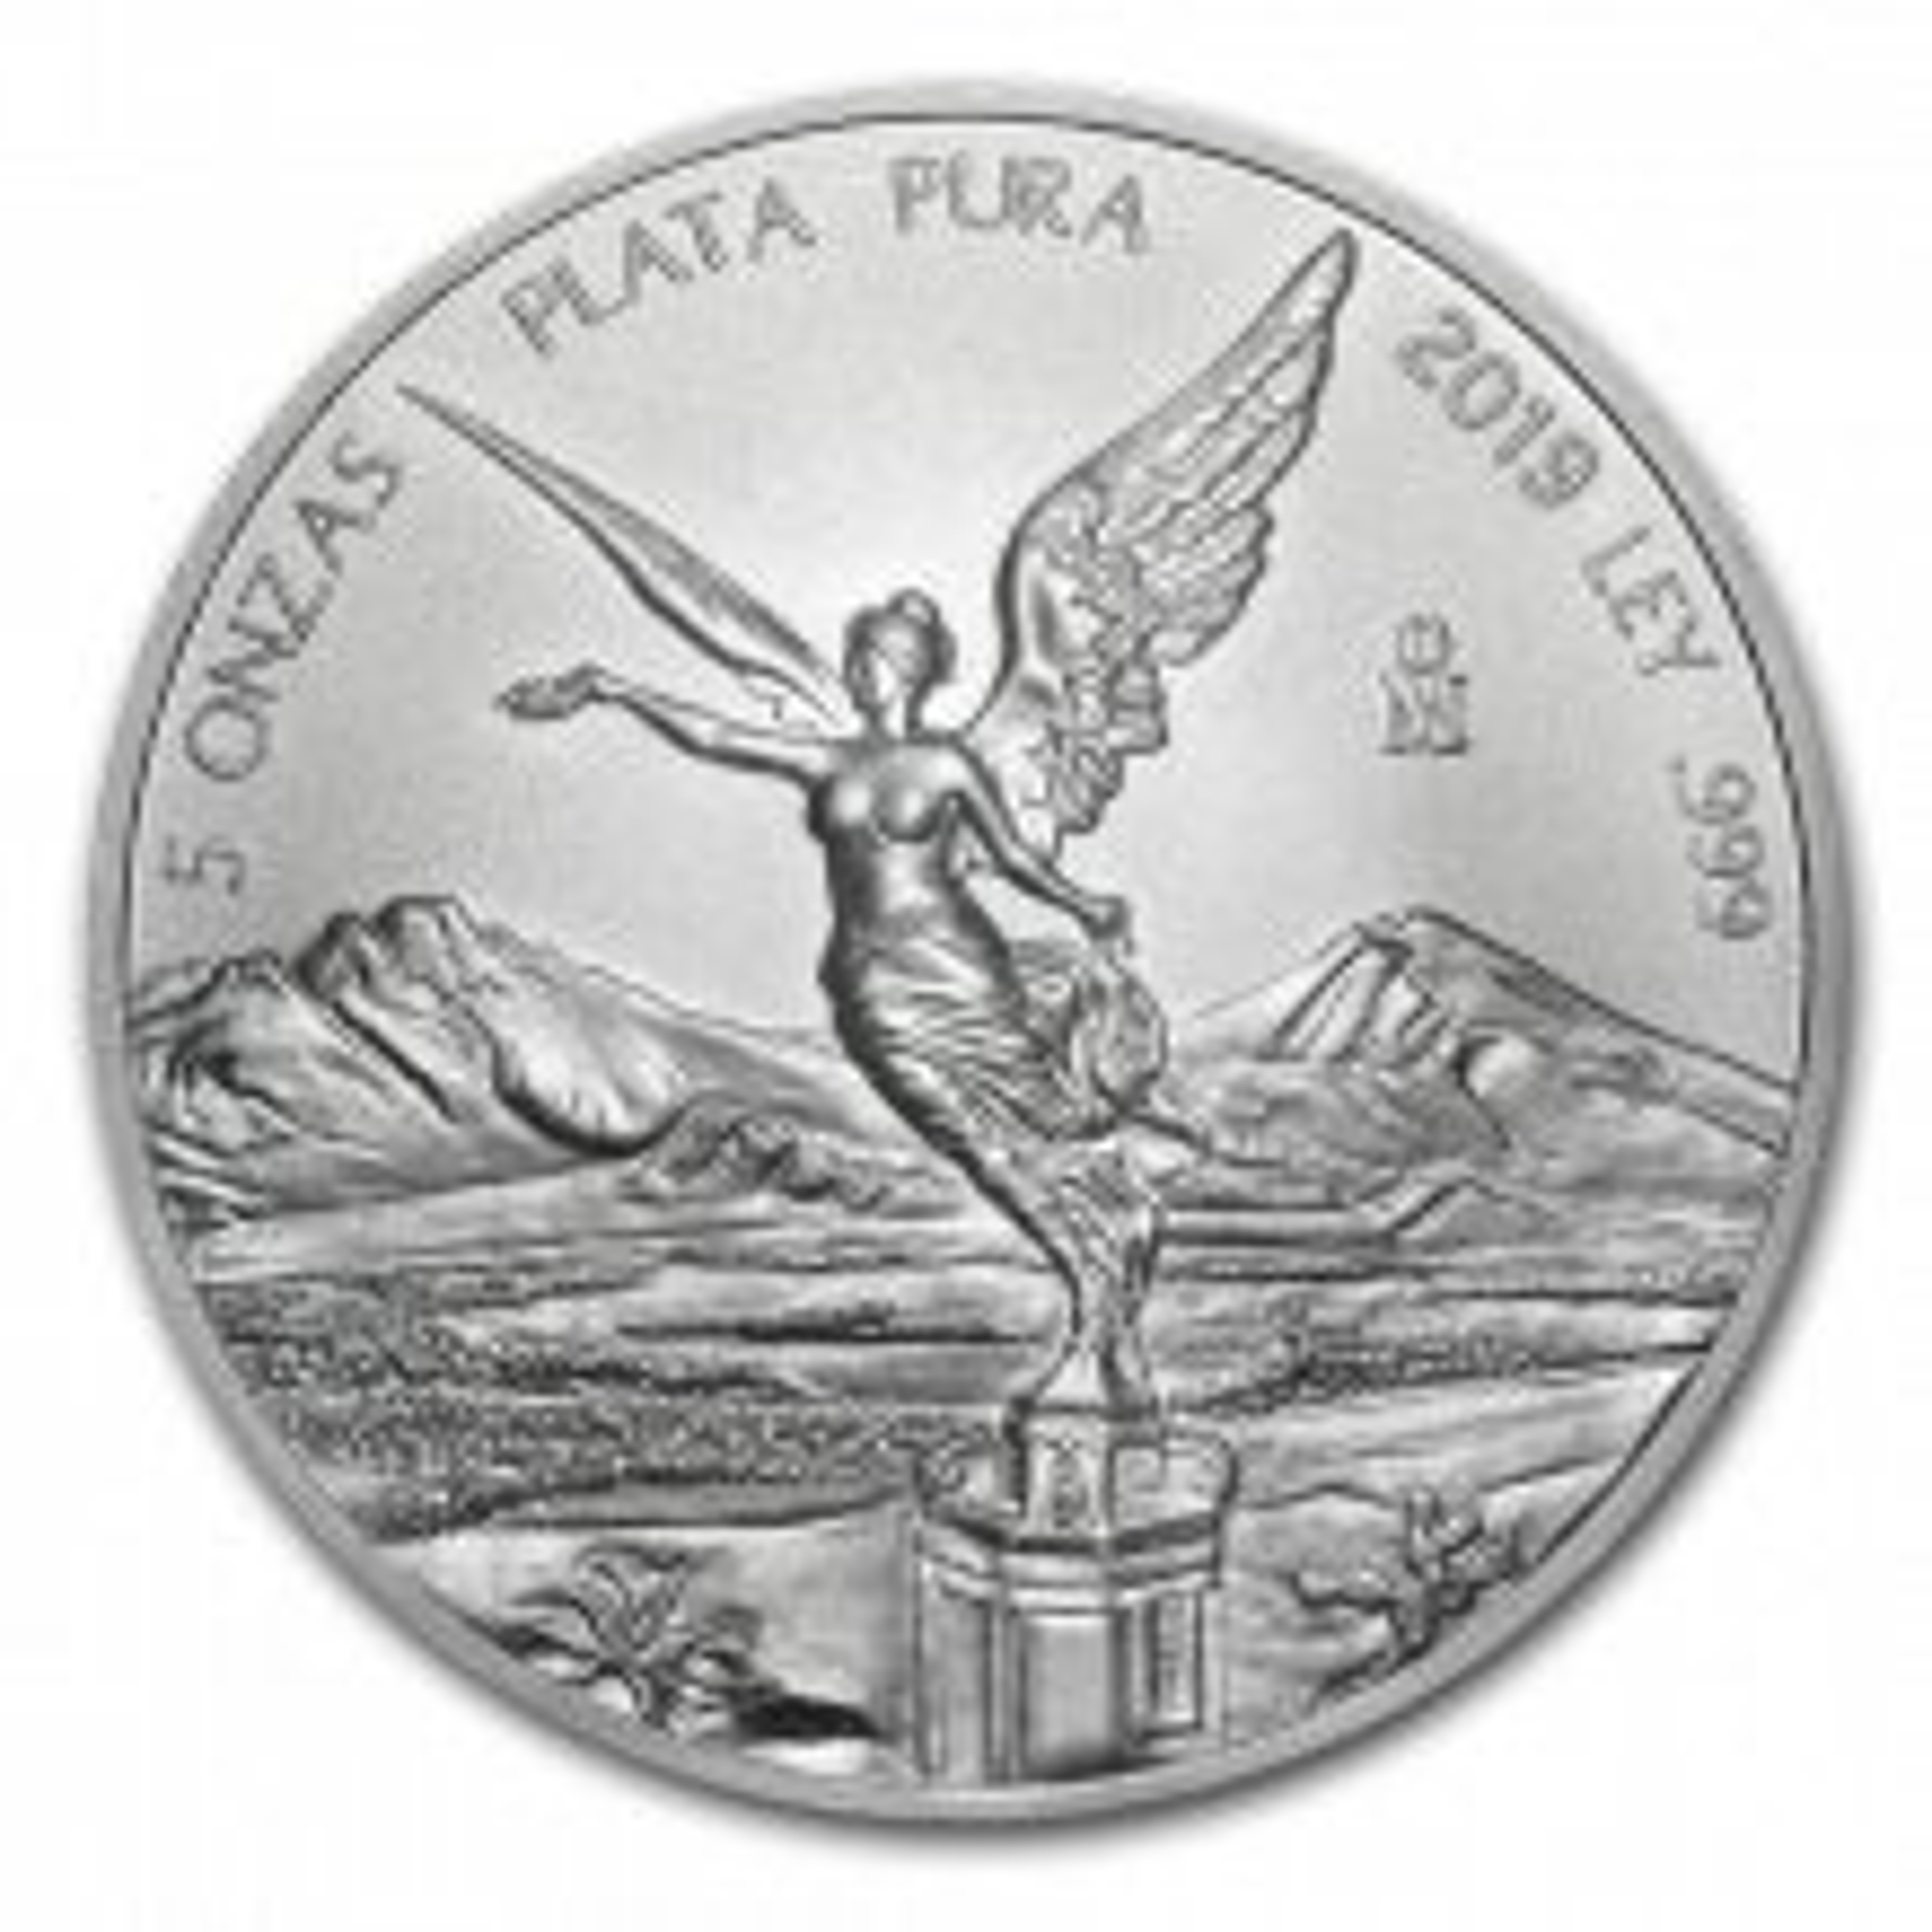 5 Troy ounce silver coin Mexican Libertad 2019